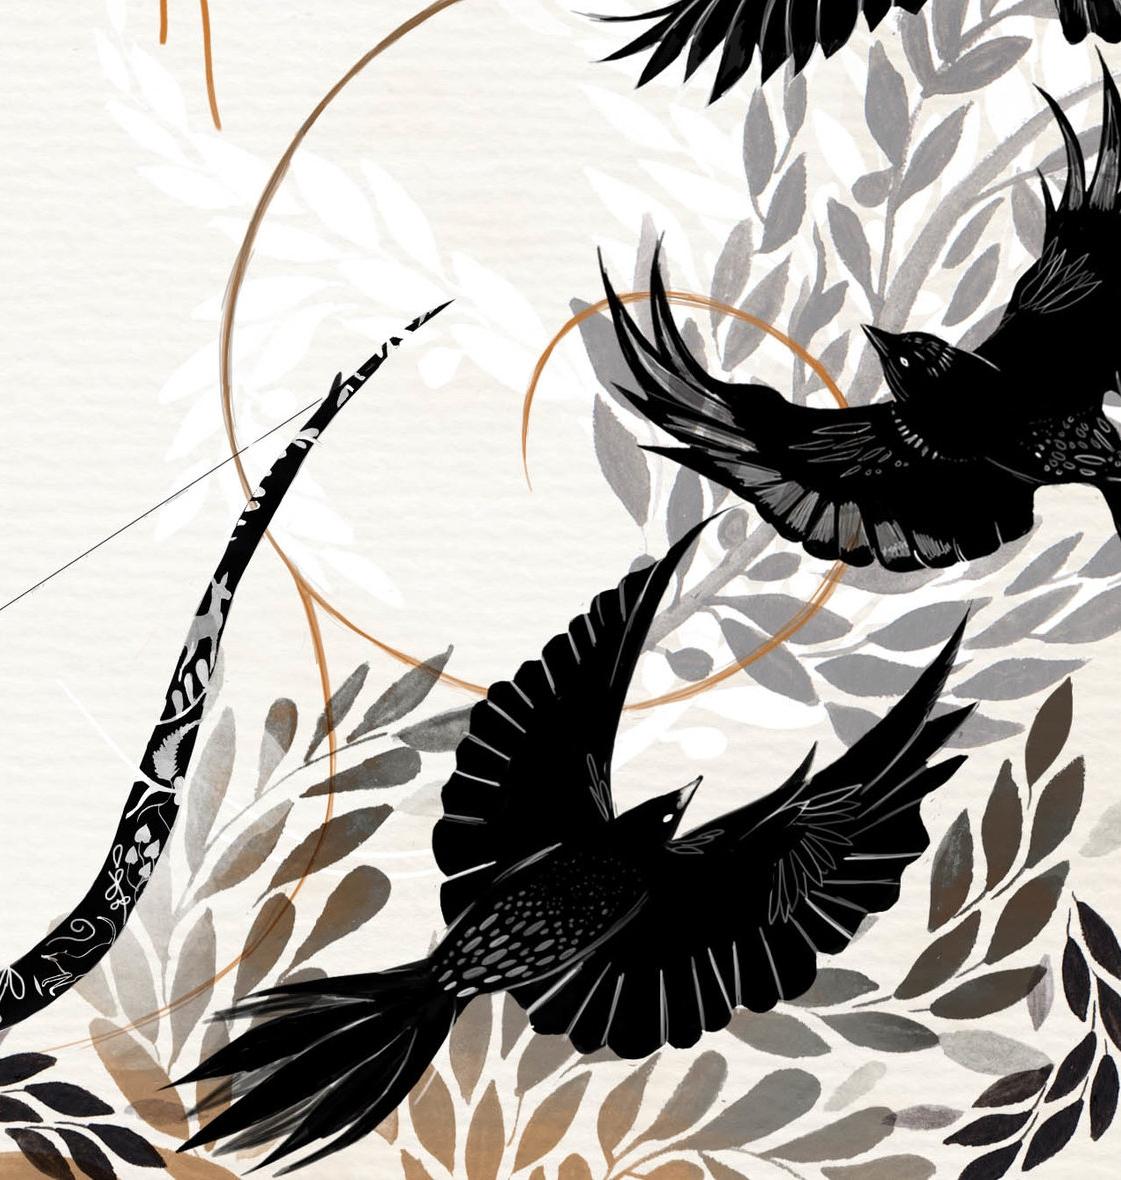 Skylark Song - May The Hunter Retreat